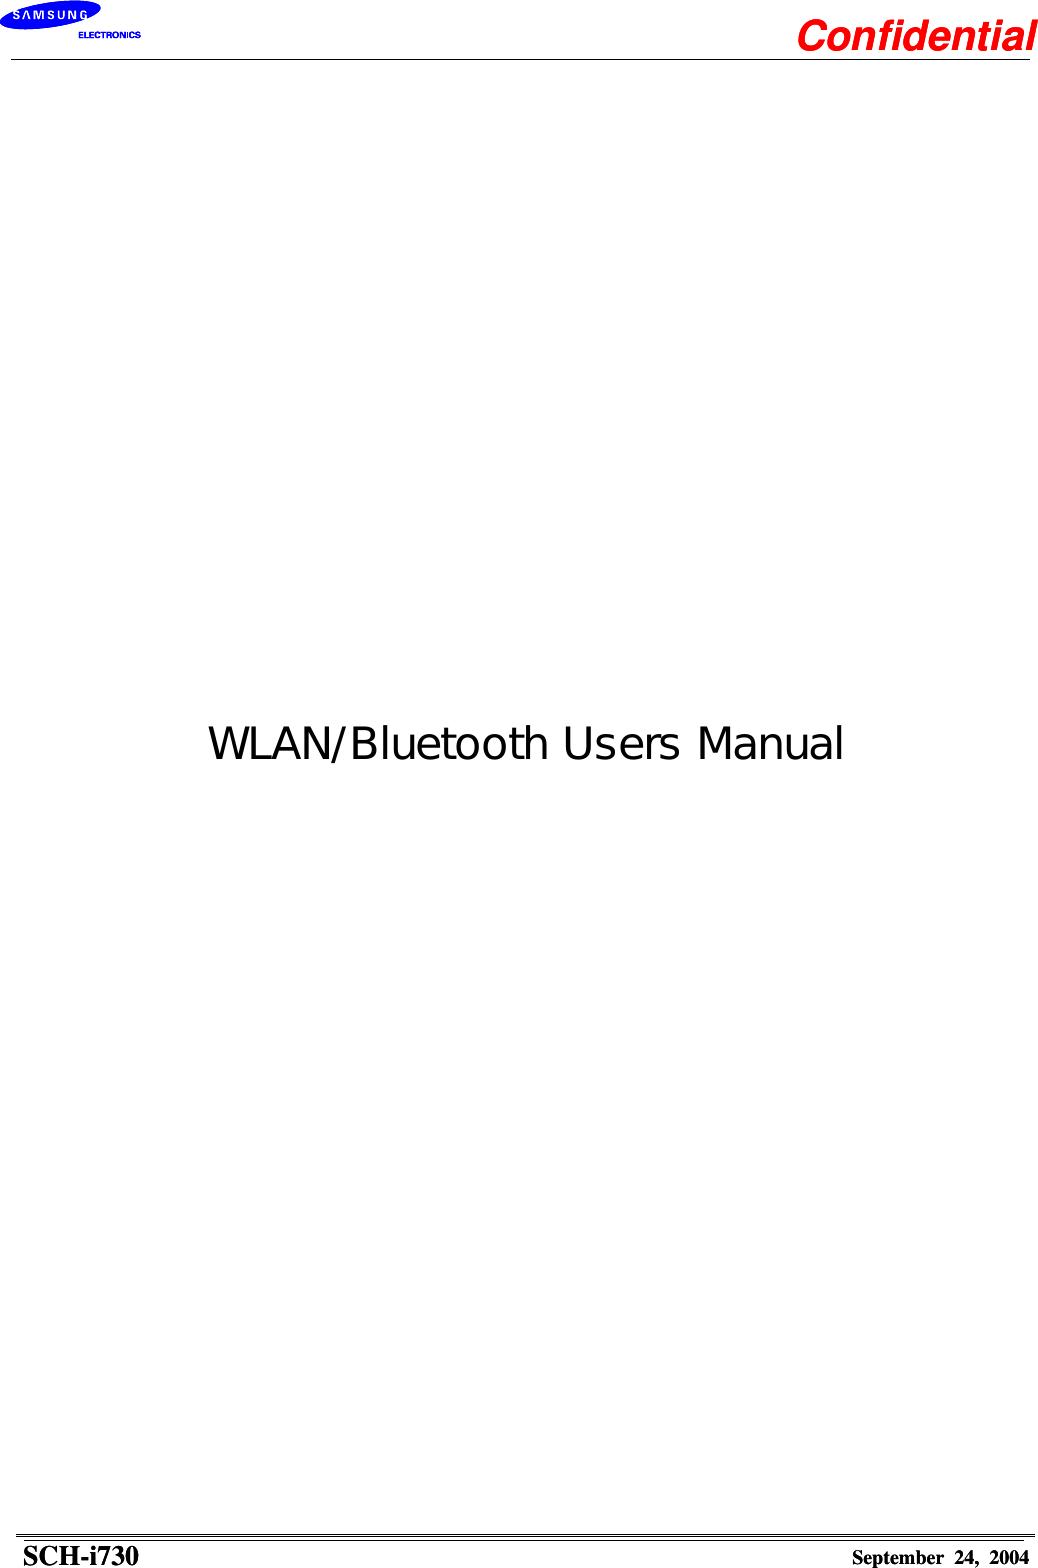 samsung electronics co schi730 dual band cdma phone w wlan rh usermanual wiki Samsung RFG298 Manual Manual Samsung UN32EH4000F